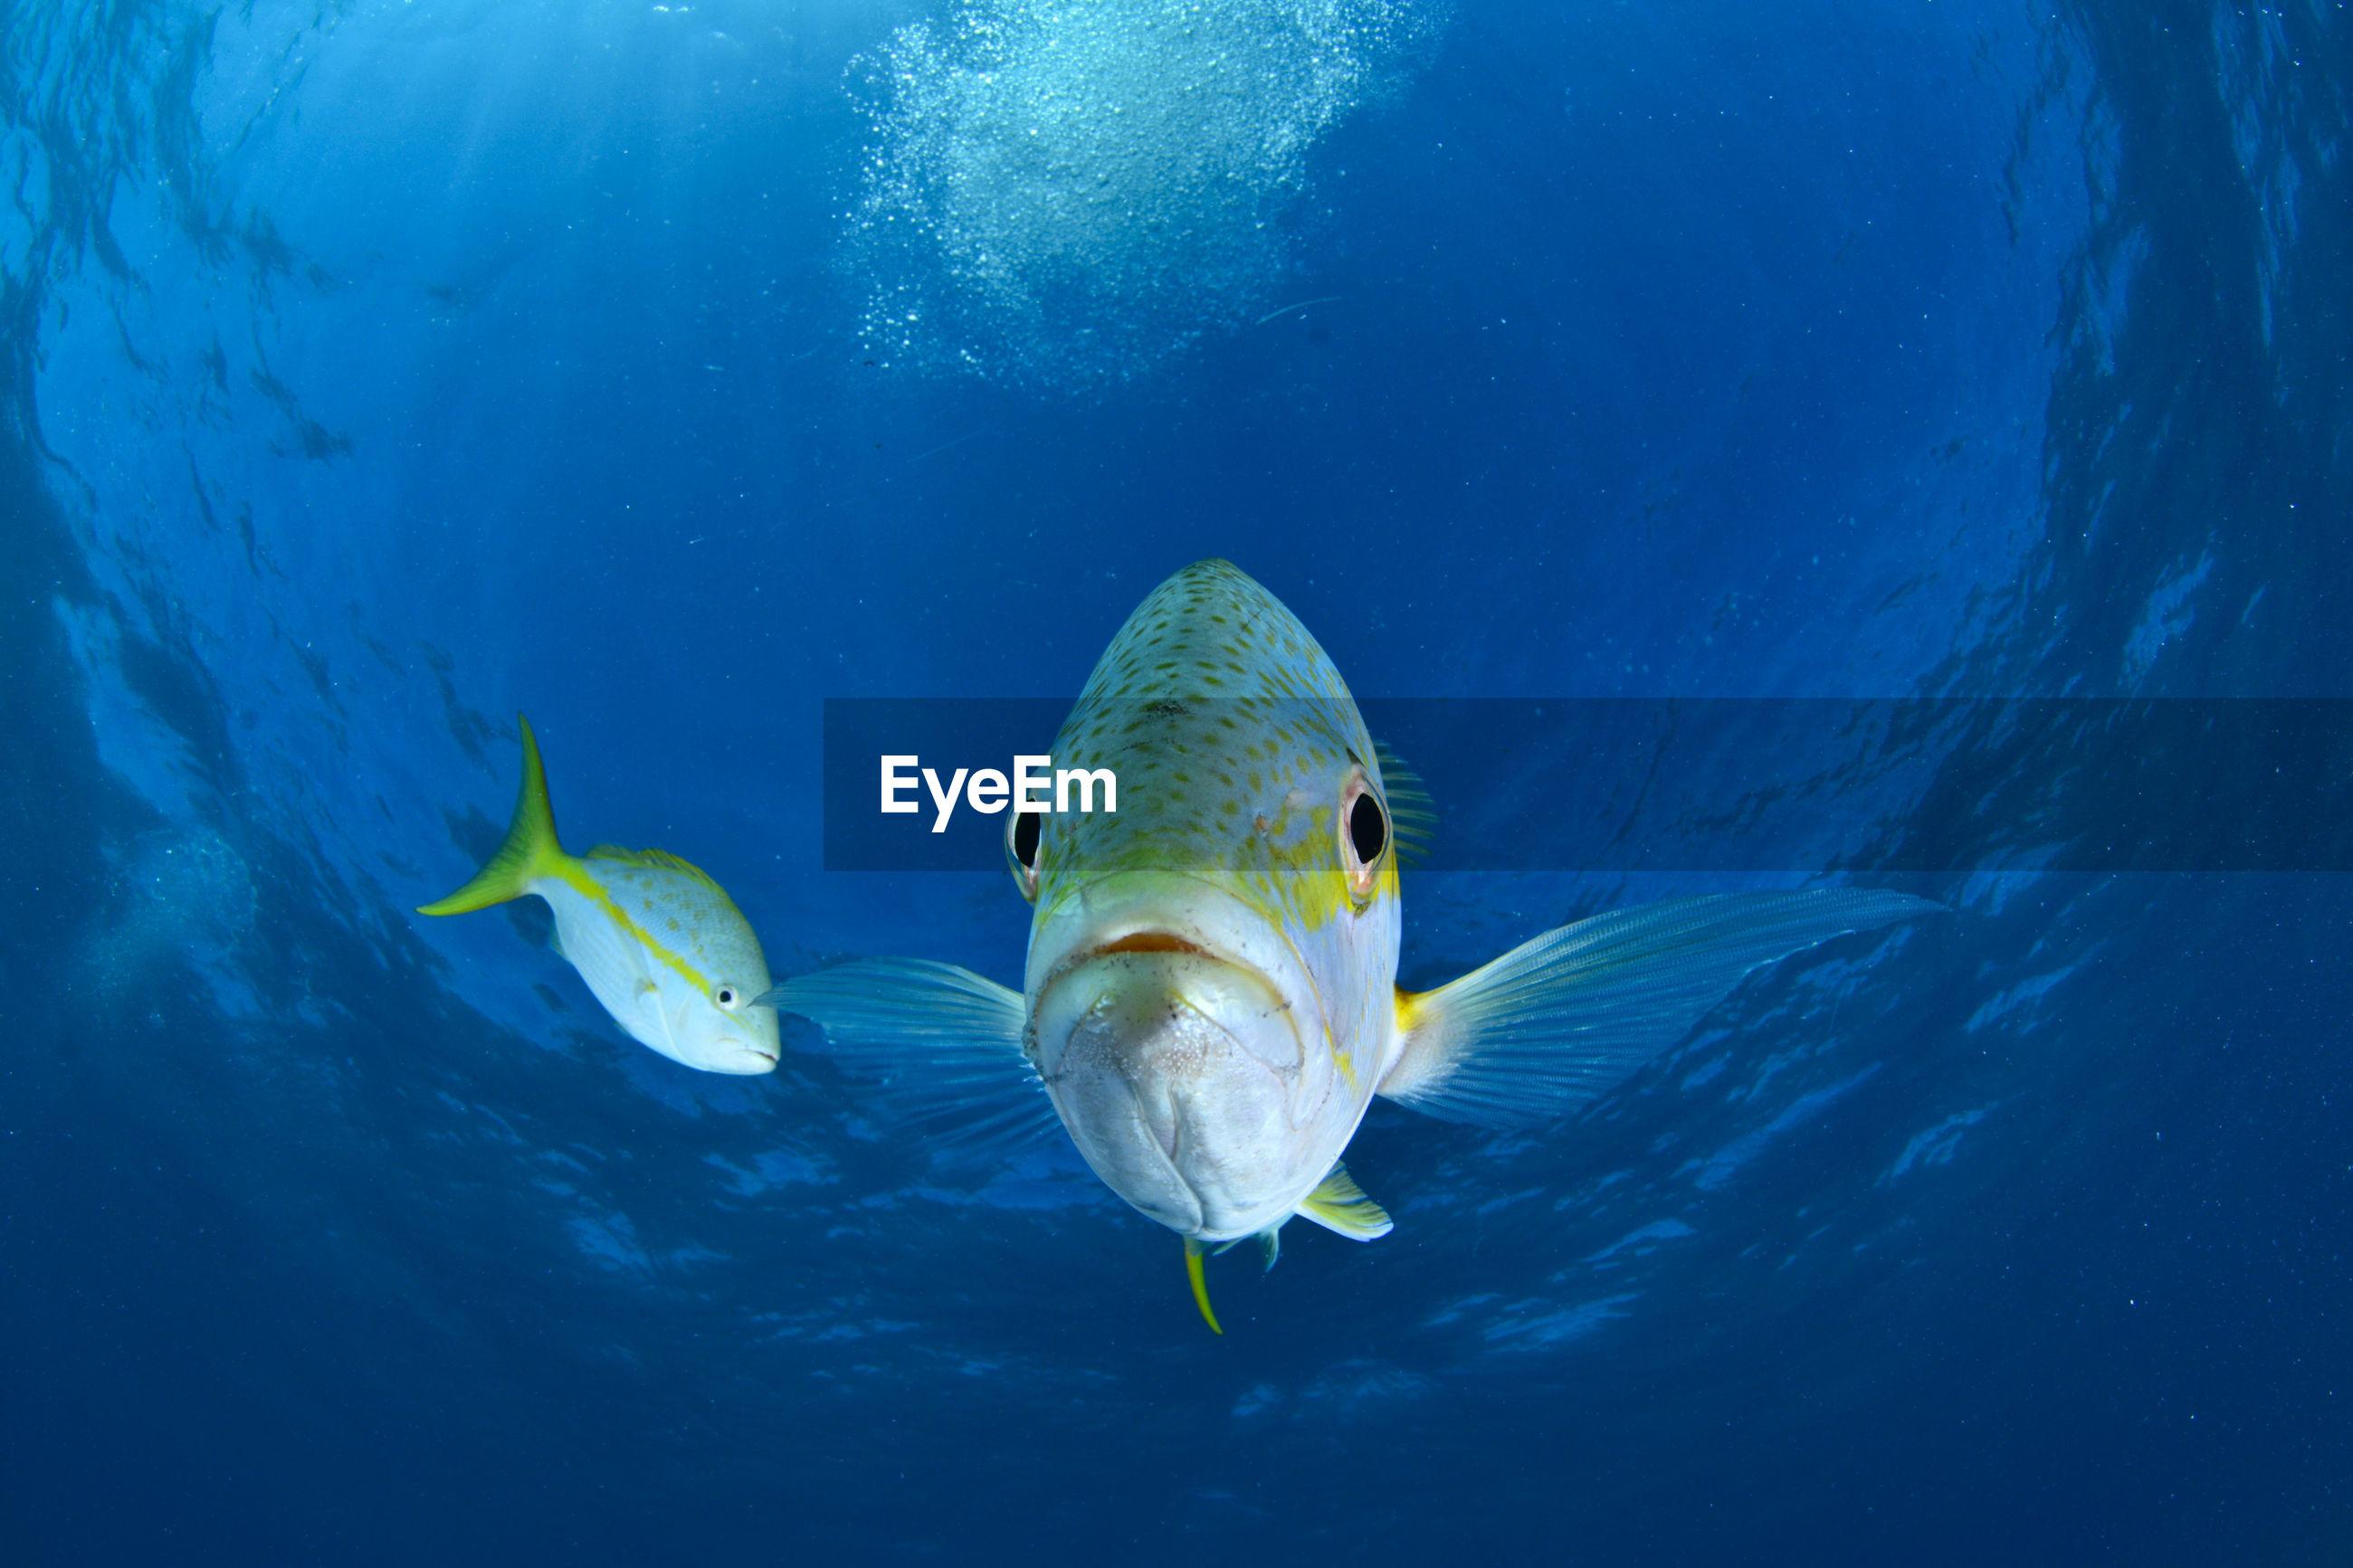 Close-up of fish looking to camera